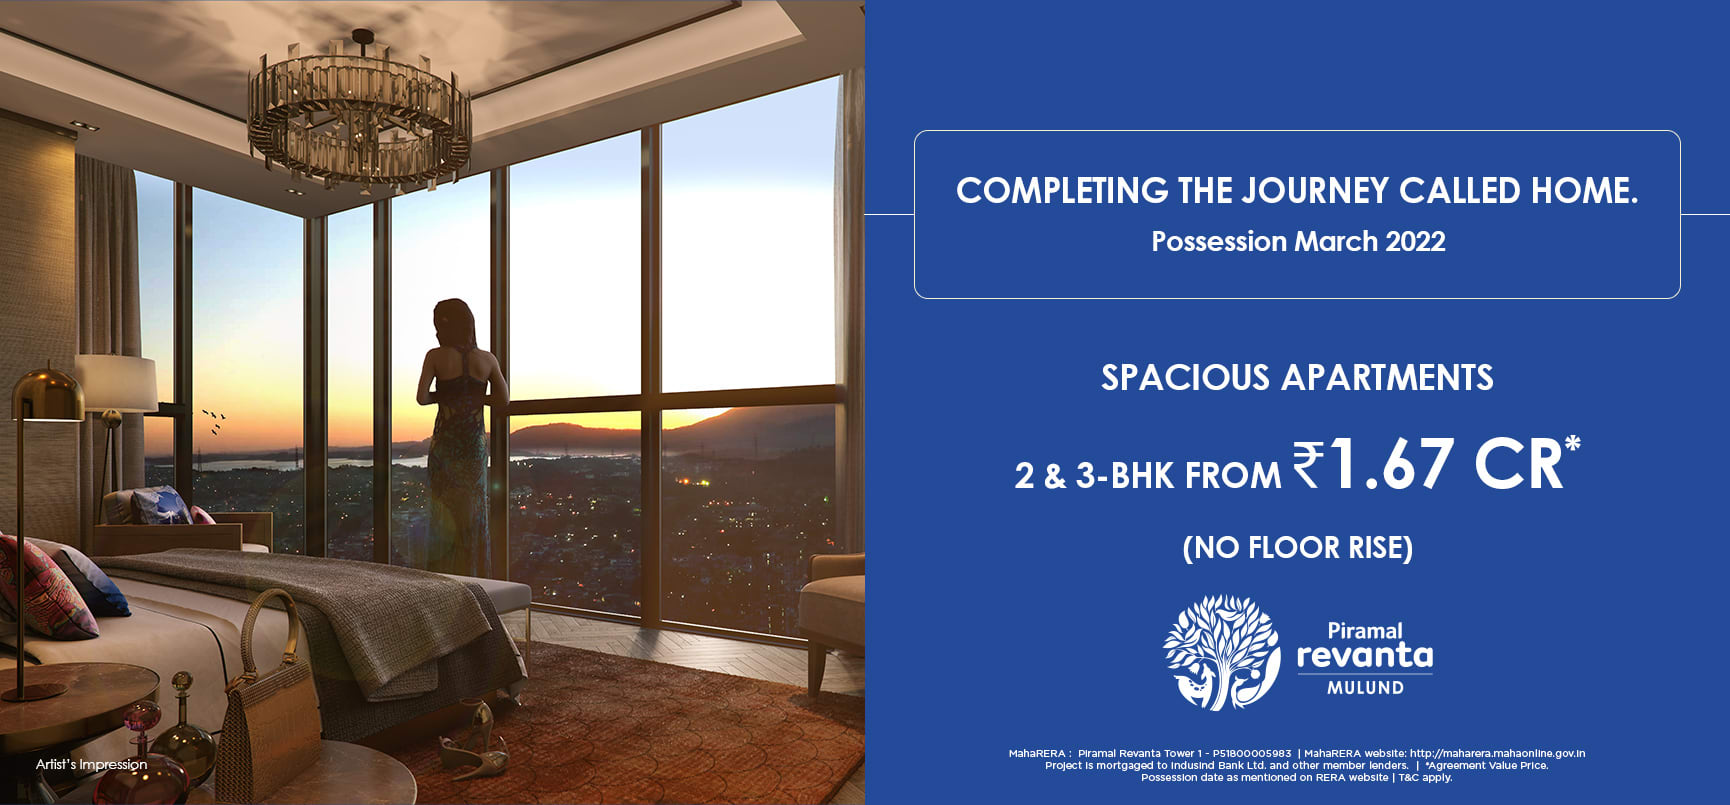 Mumbai Real Estate Developer